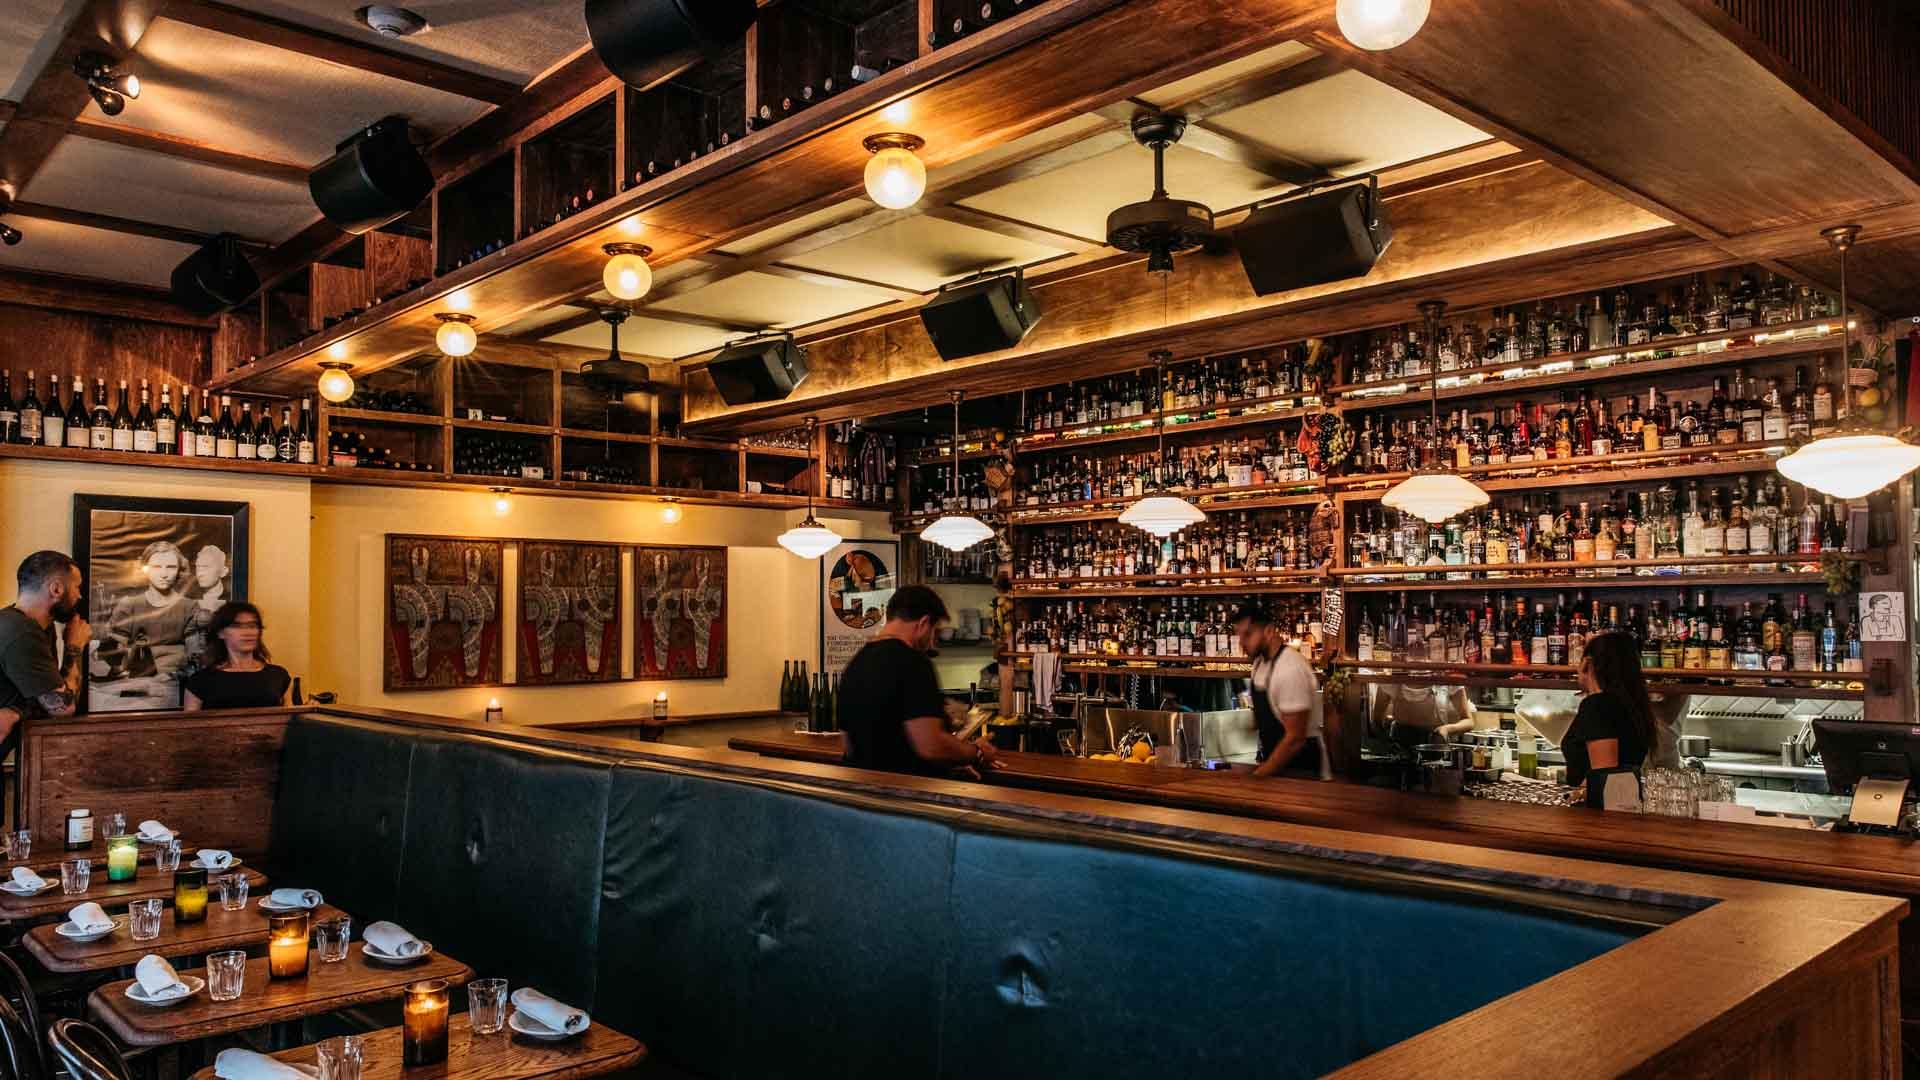 Alberto's Lounge Renovations - Big Build